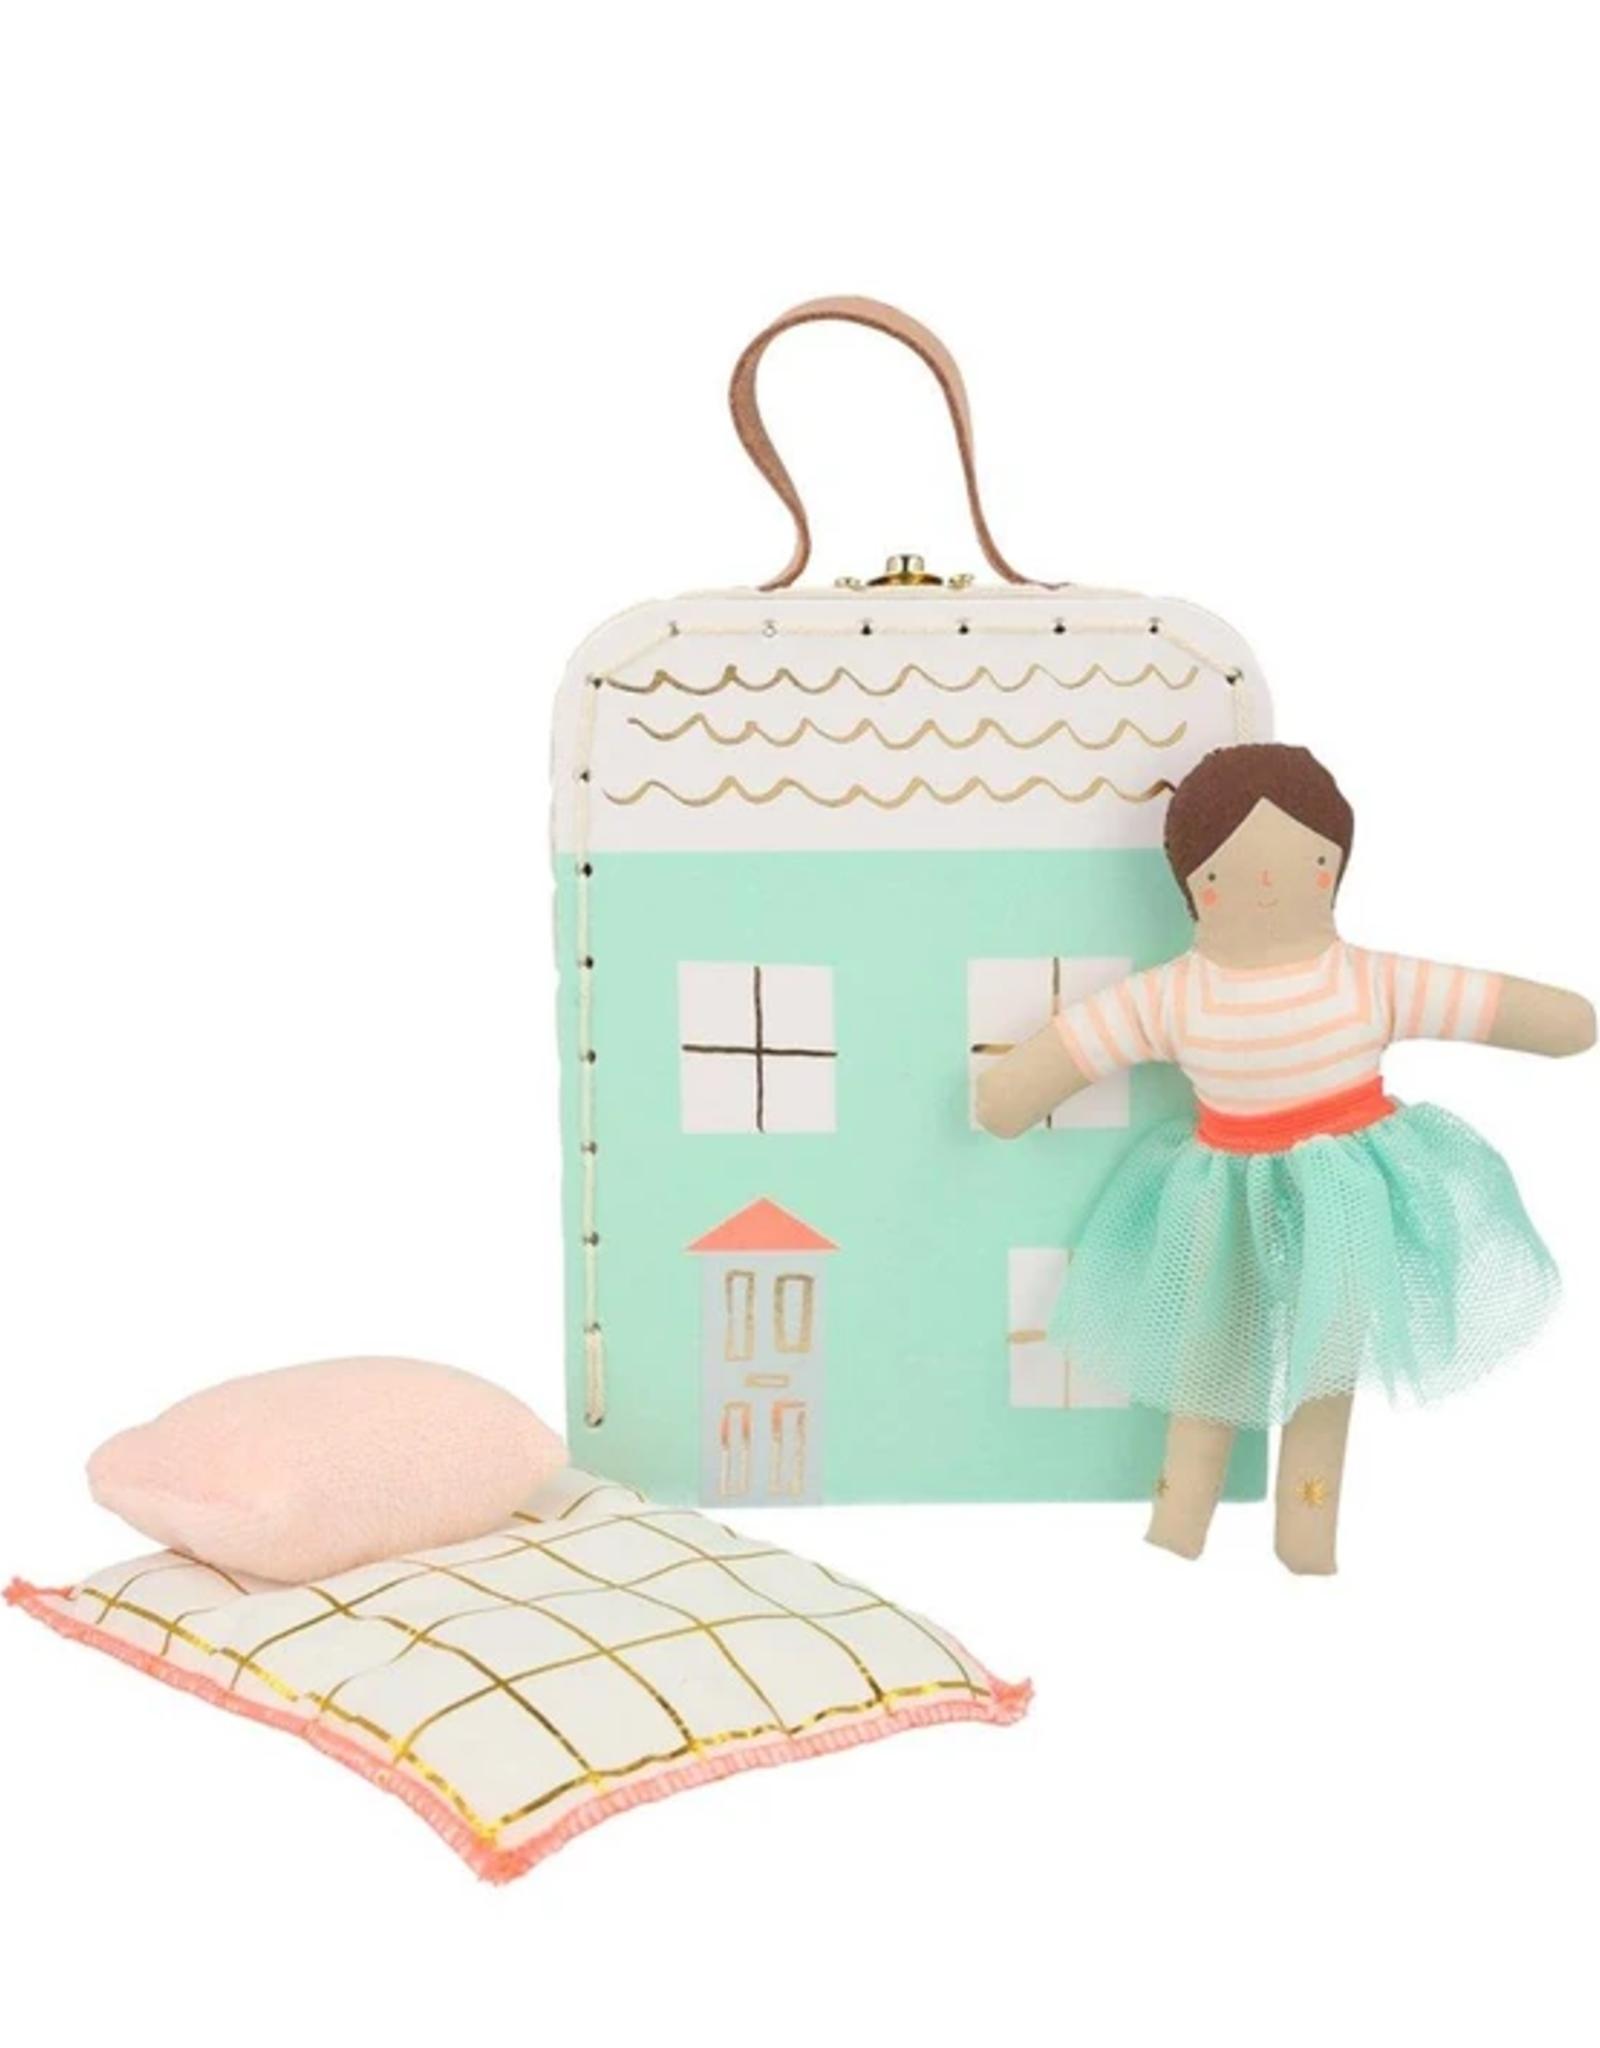 Meri Meri Mini Lila Doll Suitcase